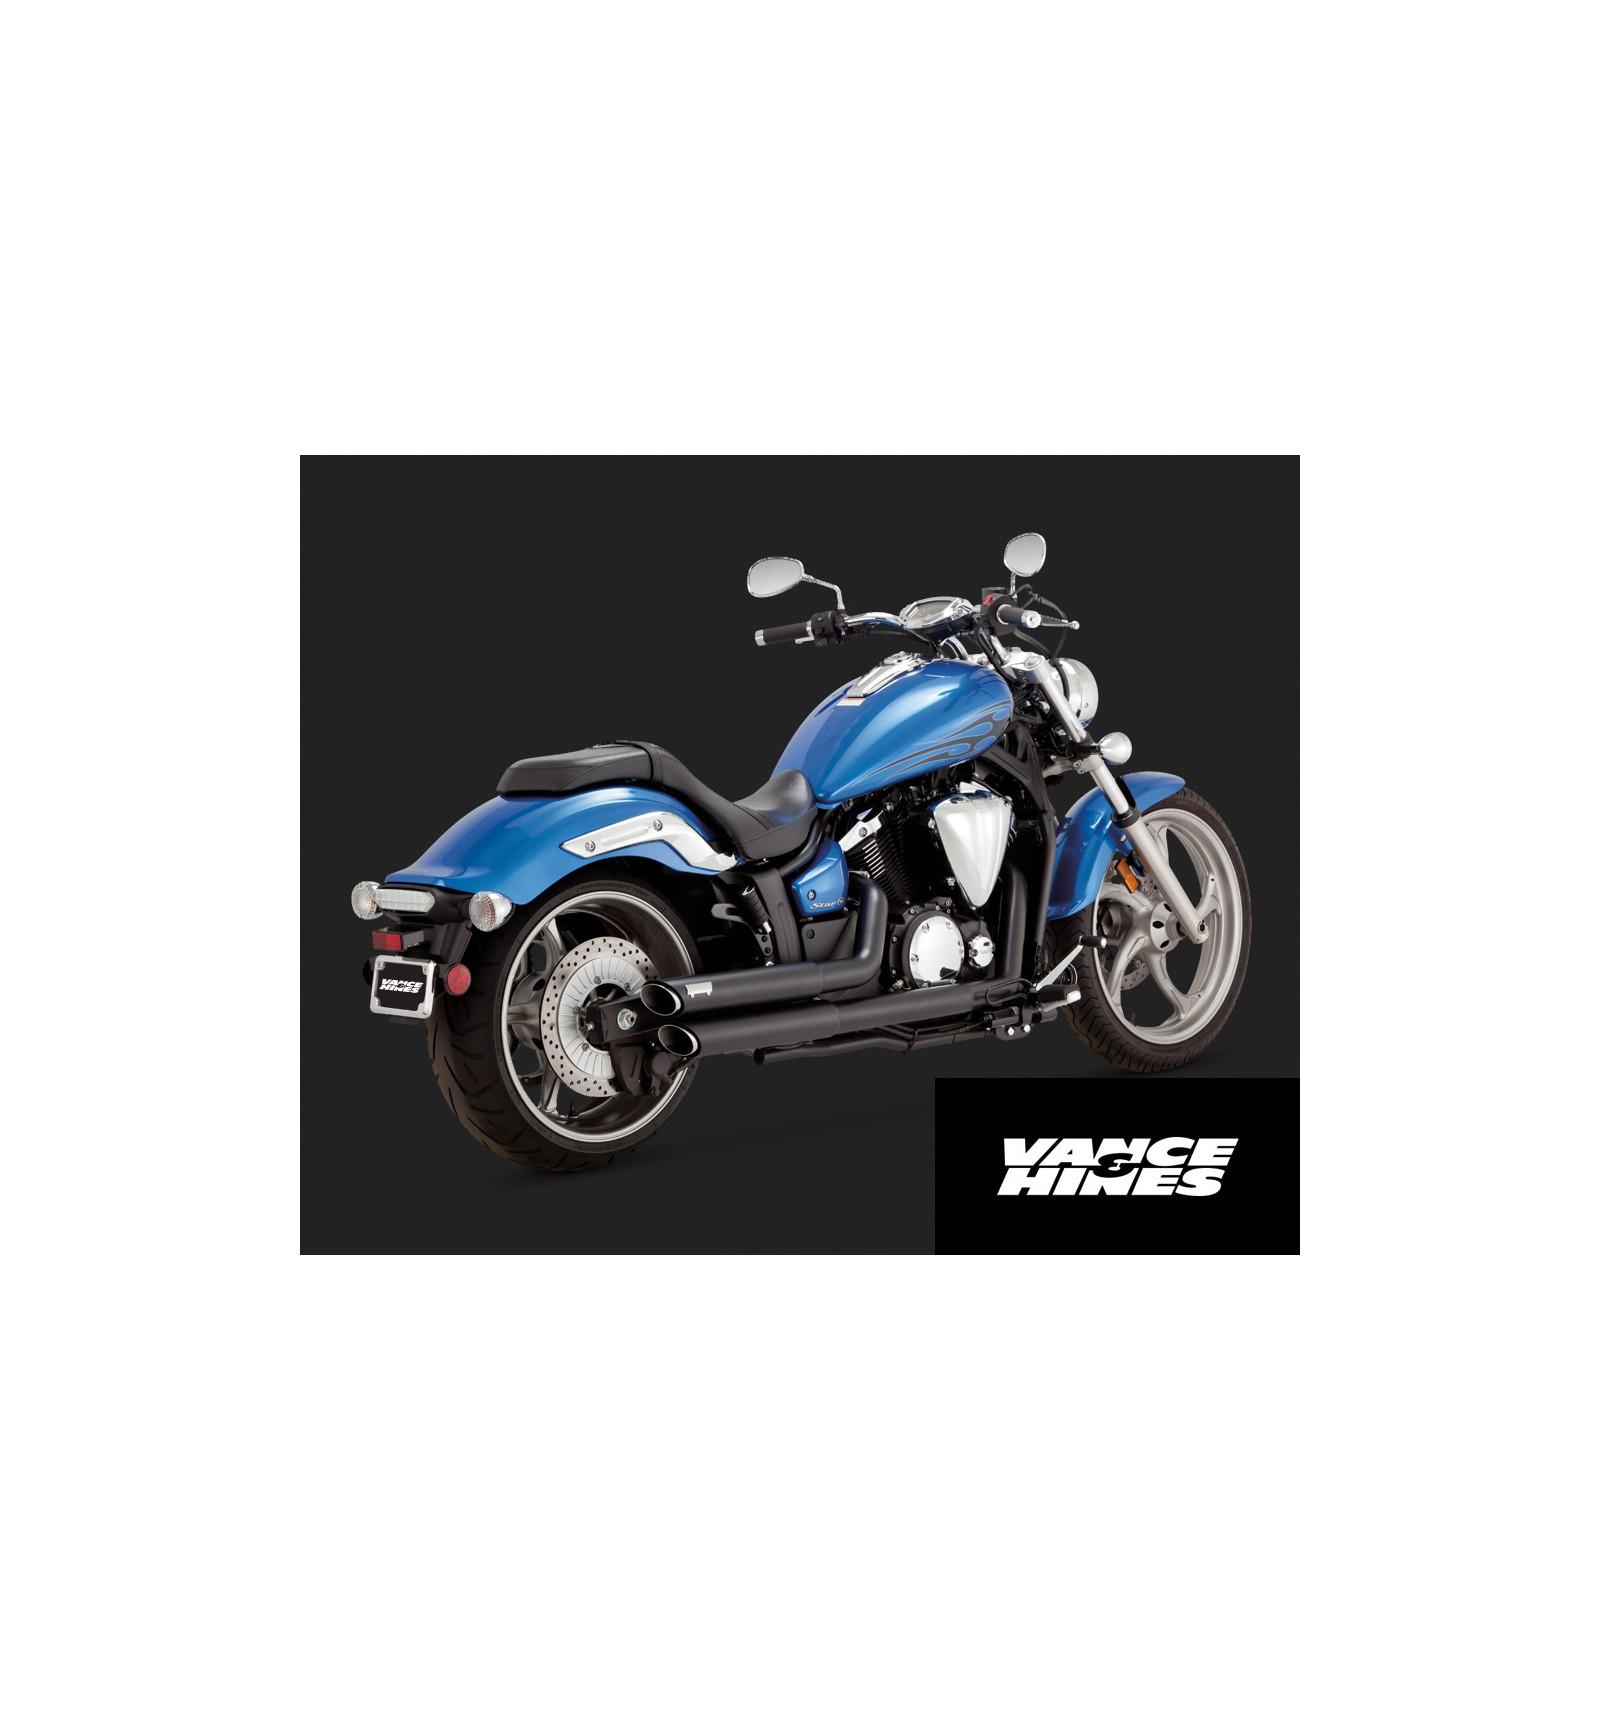 Yamaha xvs1300c custom stryker stryker bullet cowl vance for Yamaha exhaust systems